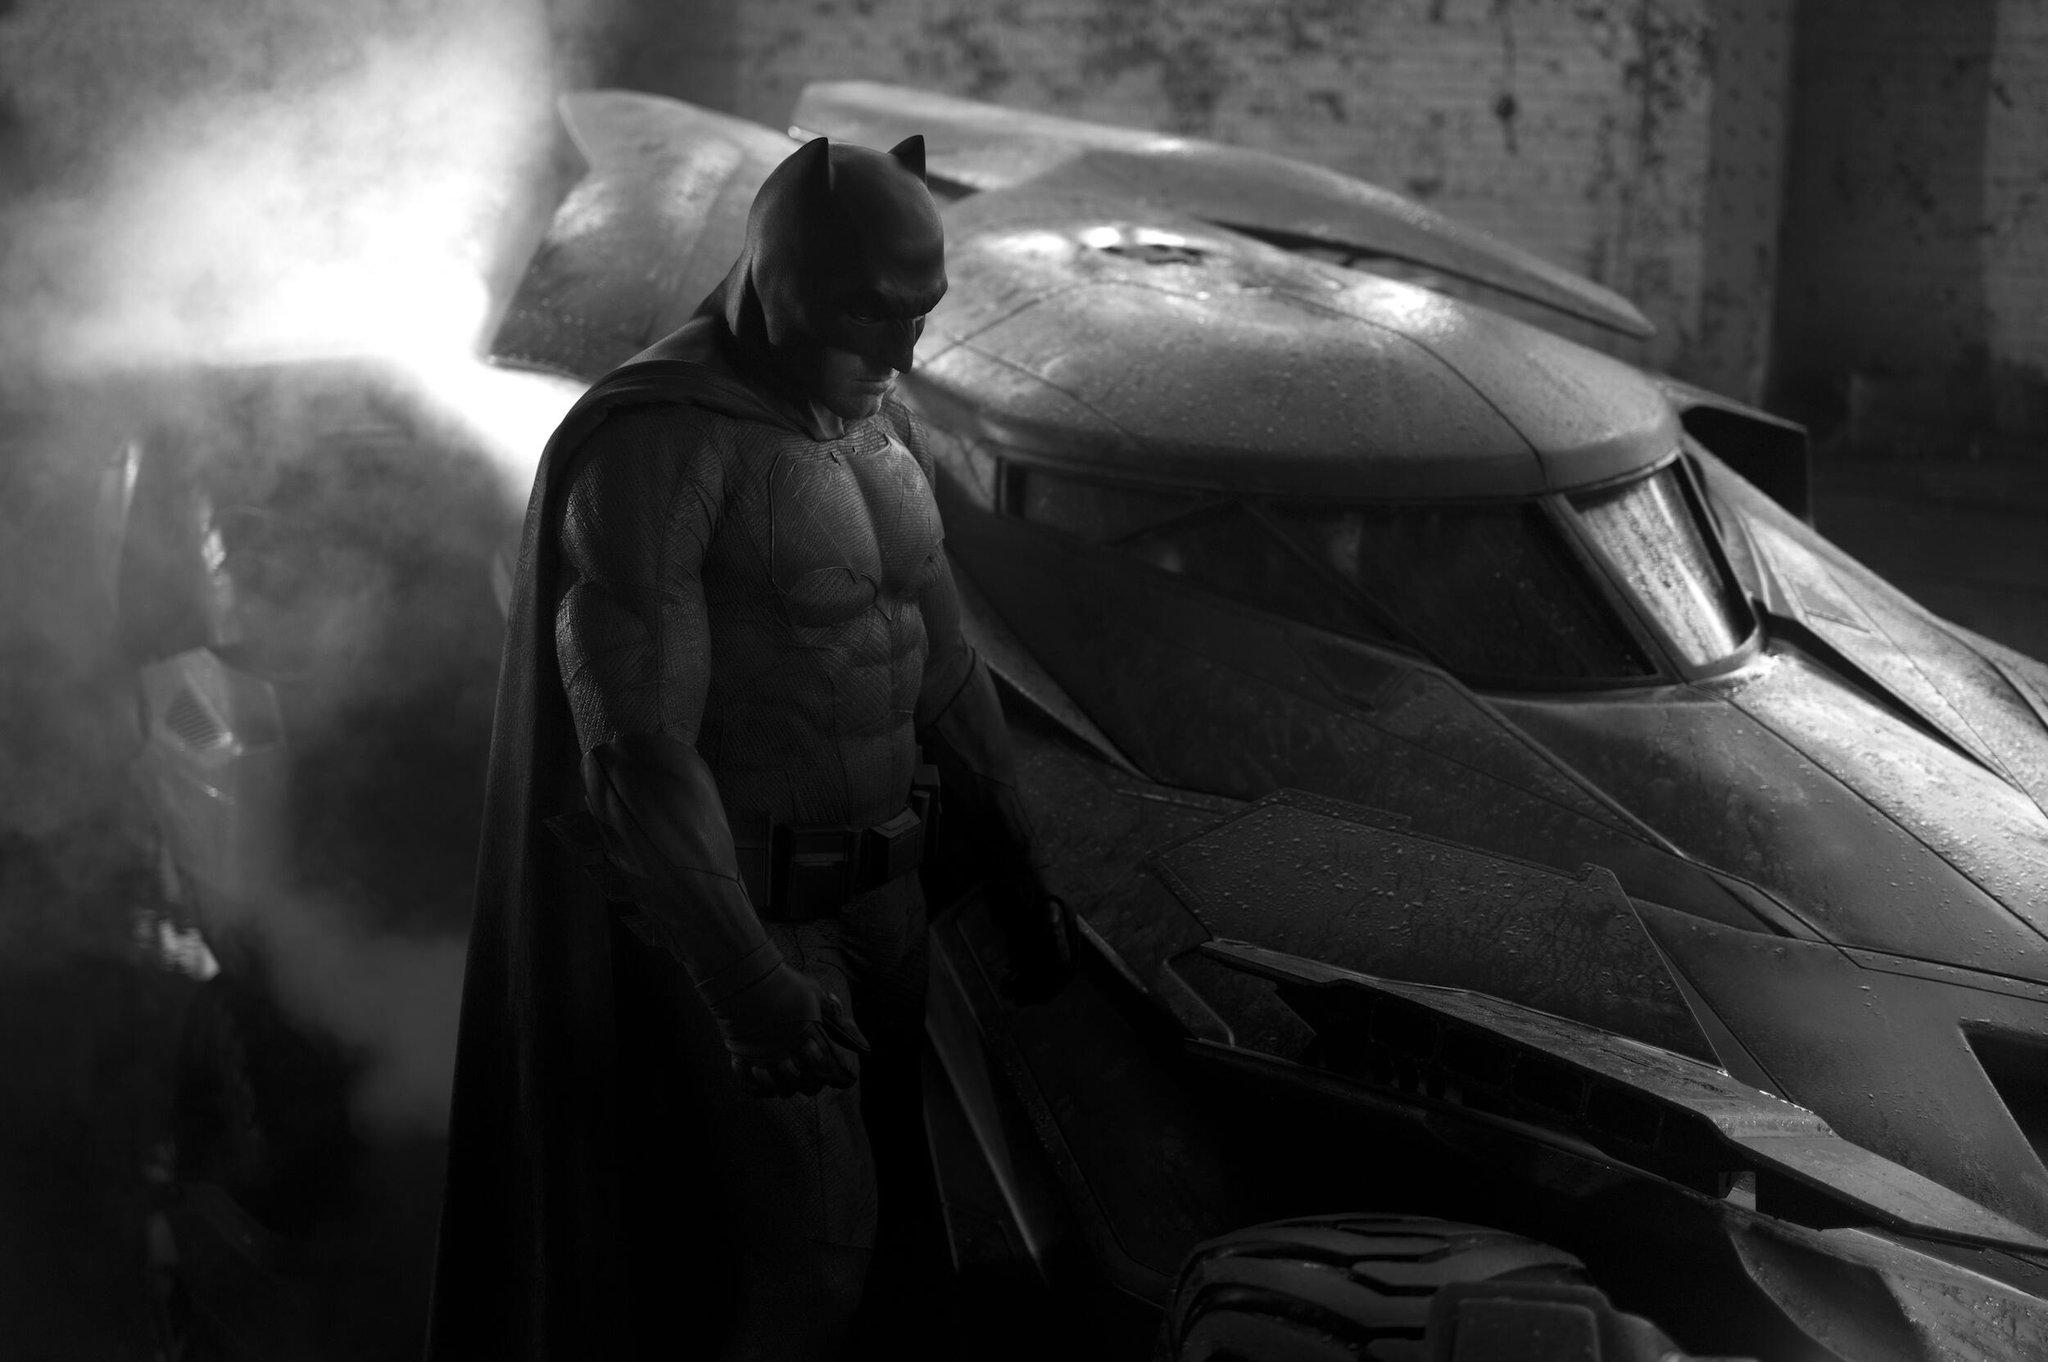 Primera imagen de Ben Affleck como Batman RT @ZackSnyder #Batman #Batmobile #Gotham http://t.co/5pegzthea4